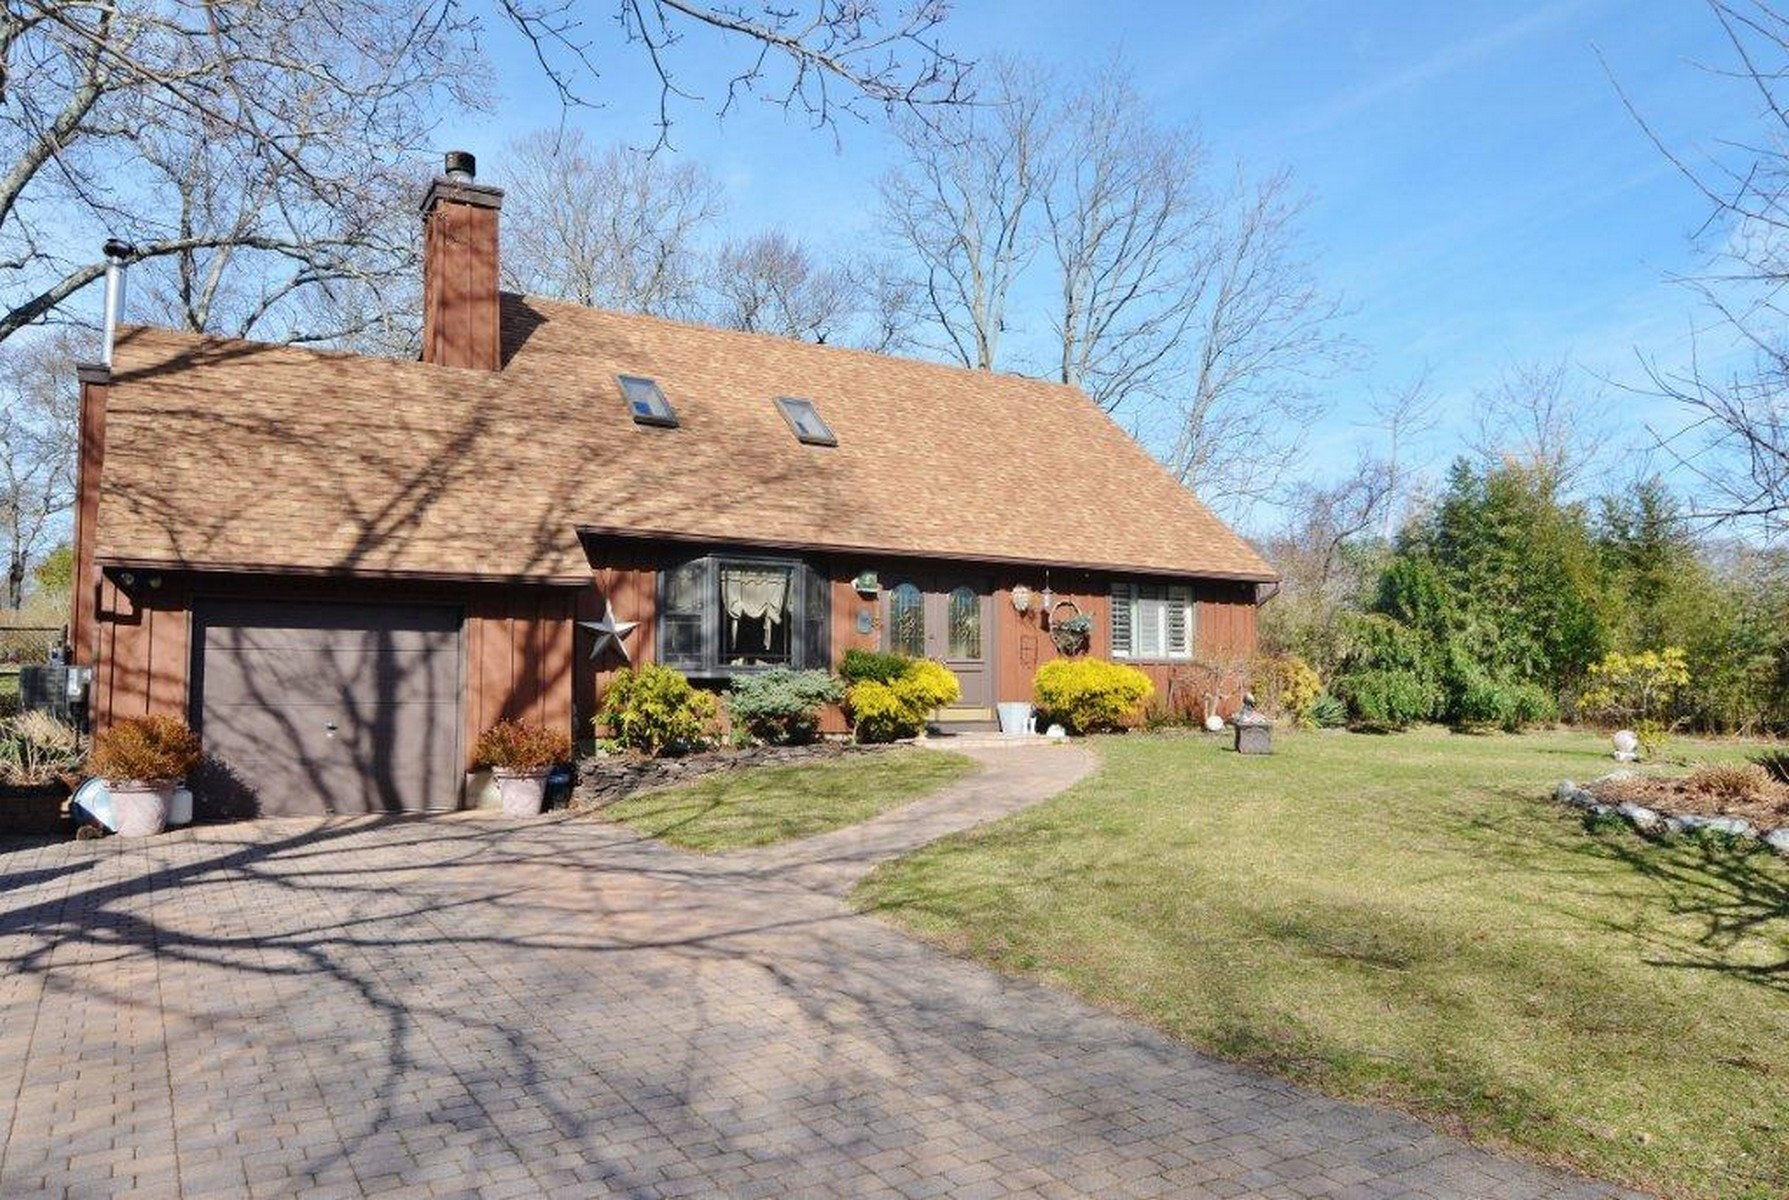 Single Family Home for Sale at Cape 156 Fox Run Ln Aquebogue, New York, 11931 United States